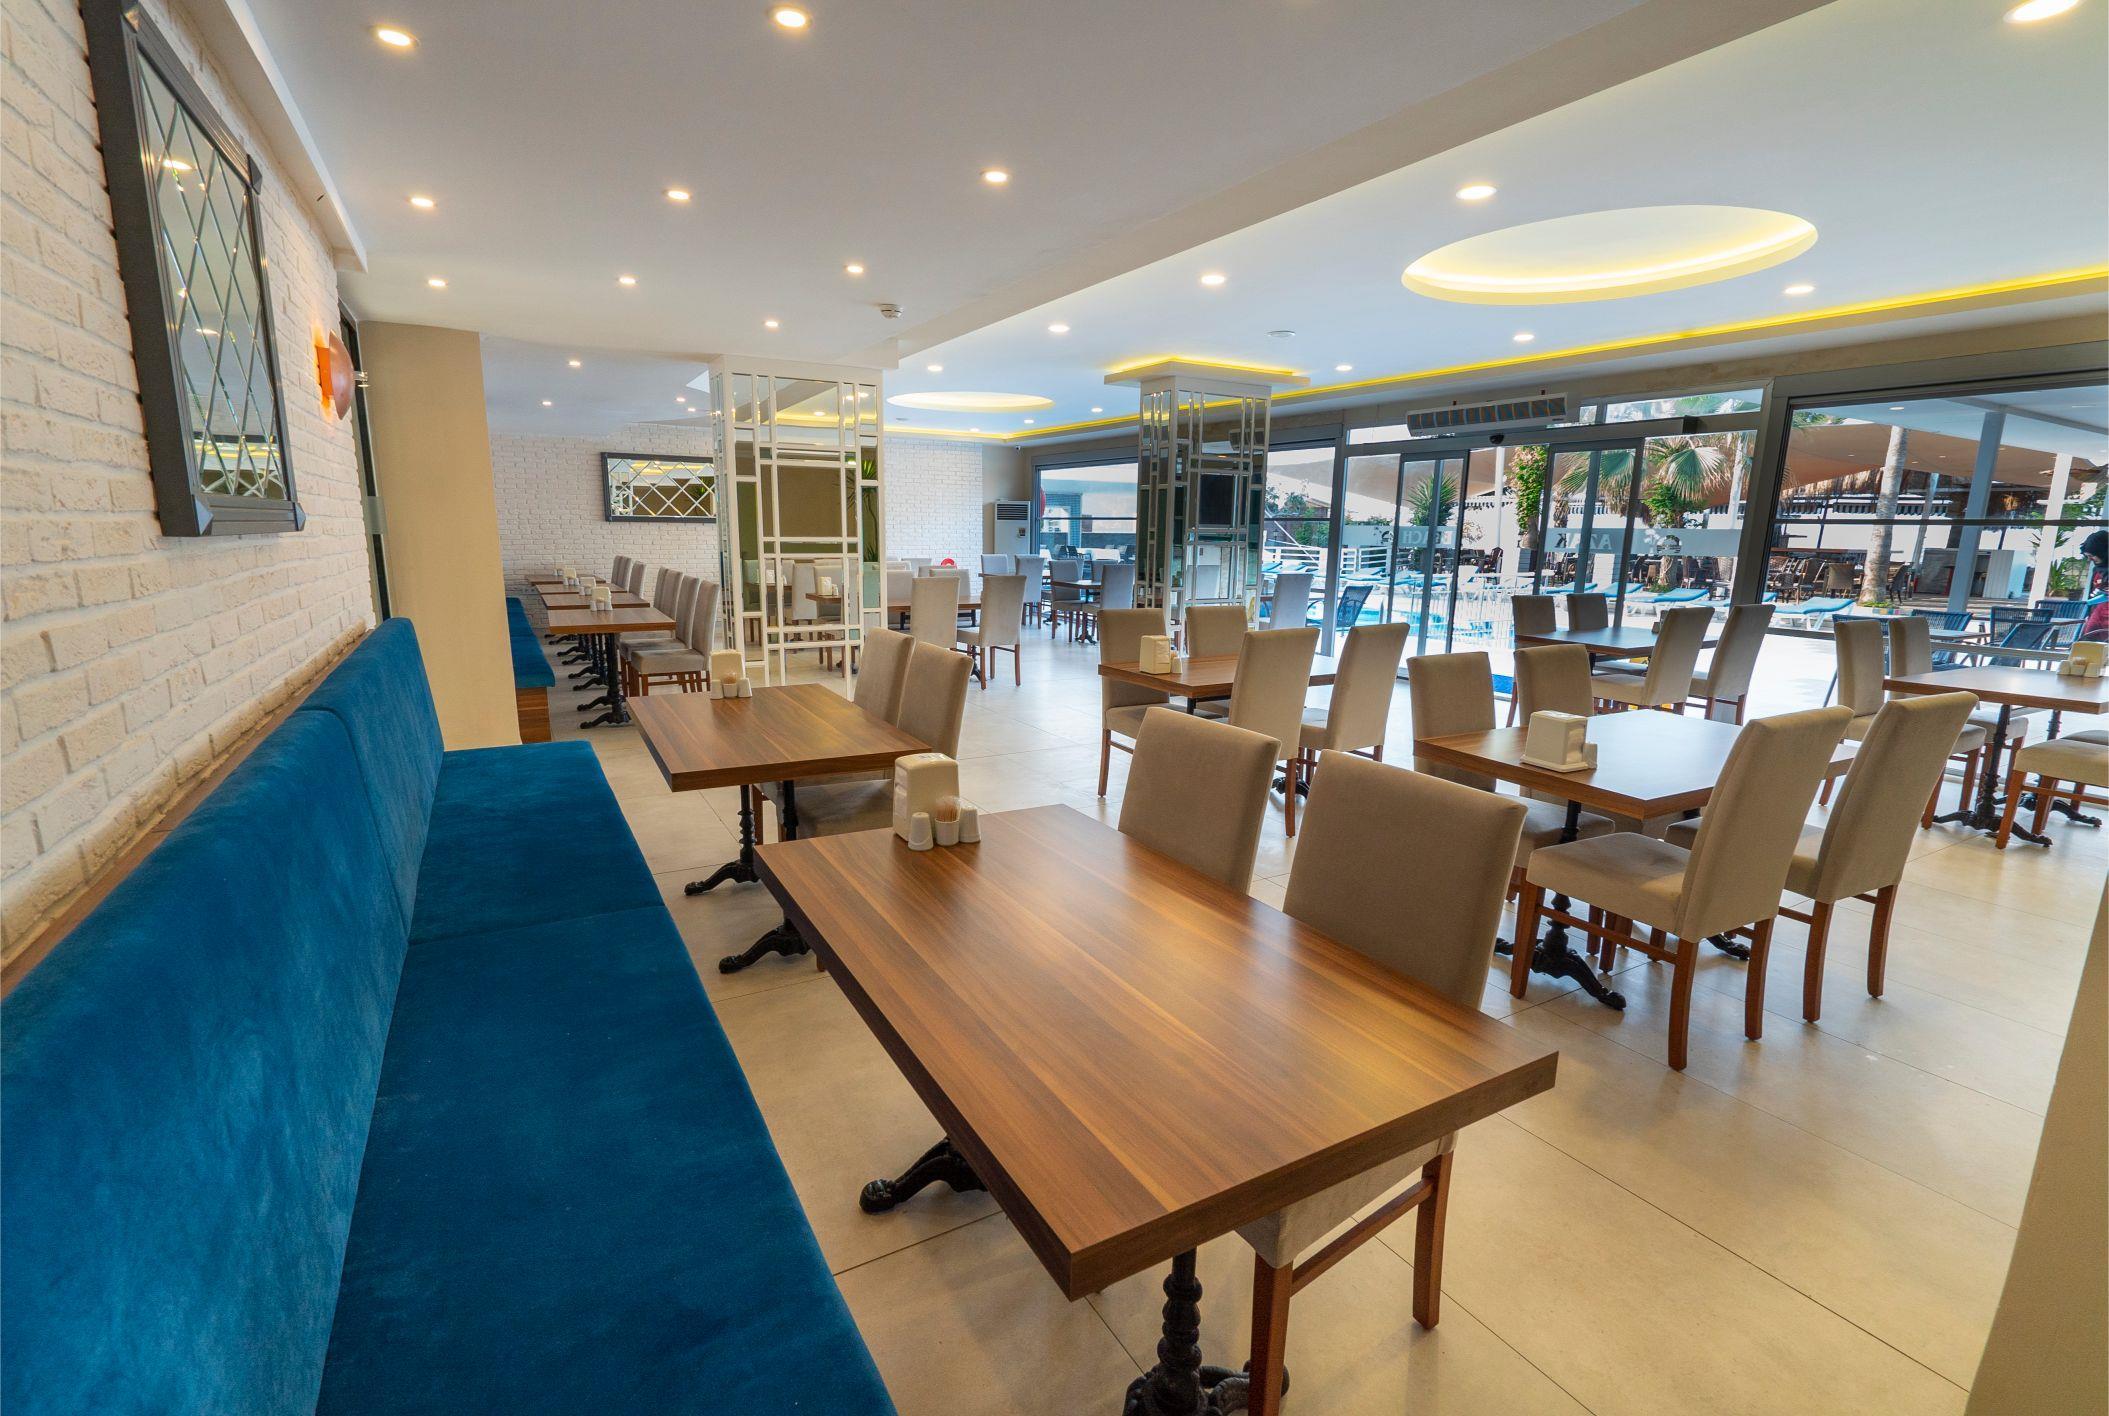 http://www.orextravel.sk/OREX/hotelphotos/azak-beach-general-0027.jpg